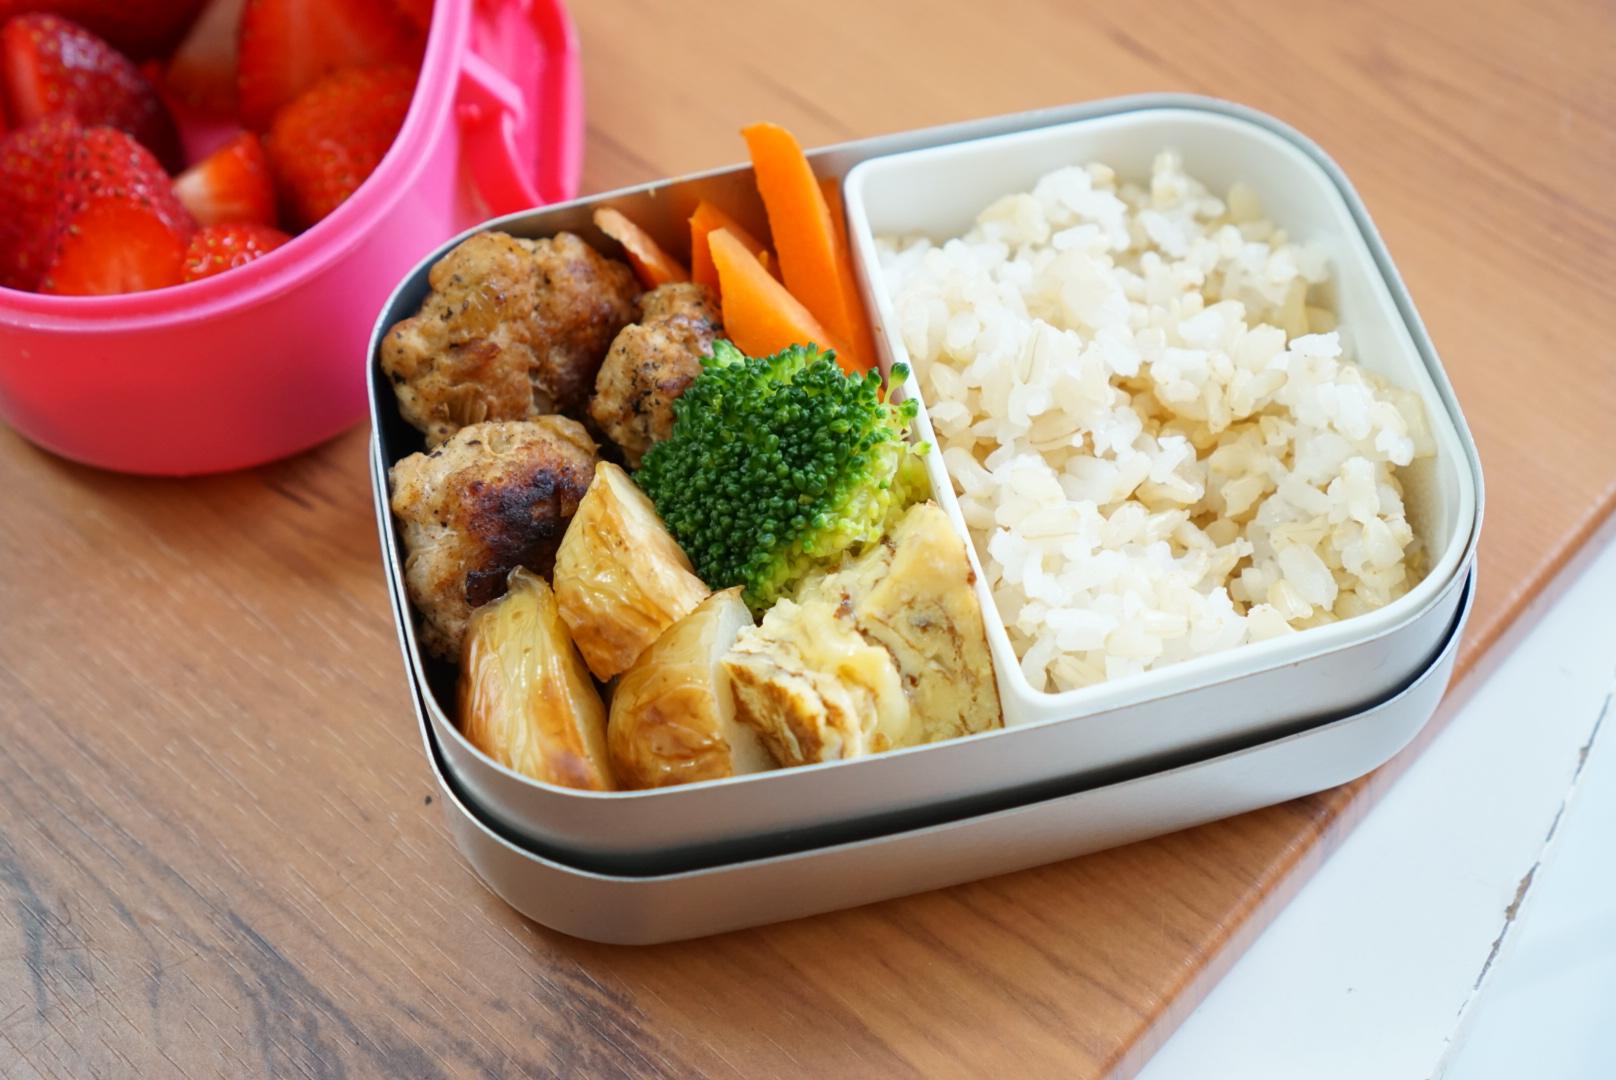 21th Thursday  Rissoles,roasted potato,egg omelette,steamed vegetables and brown rice.